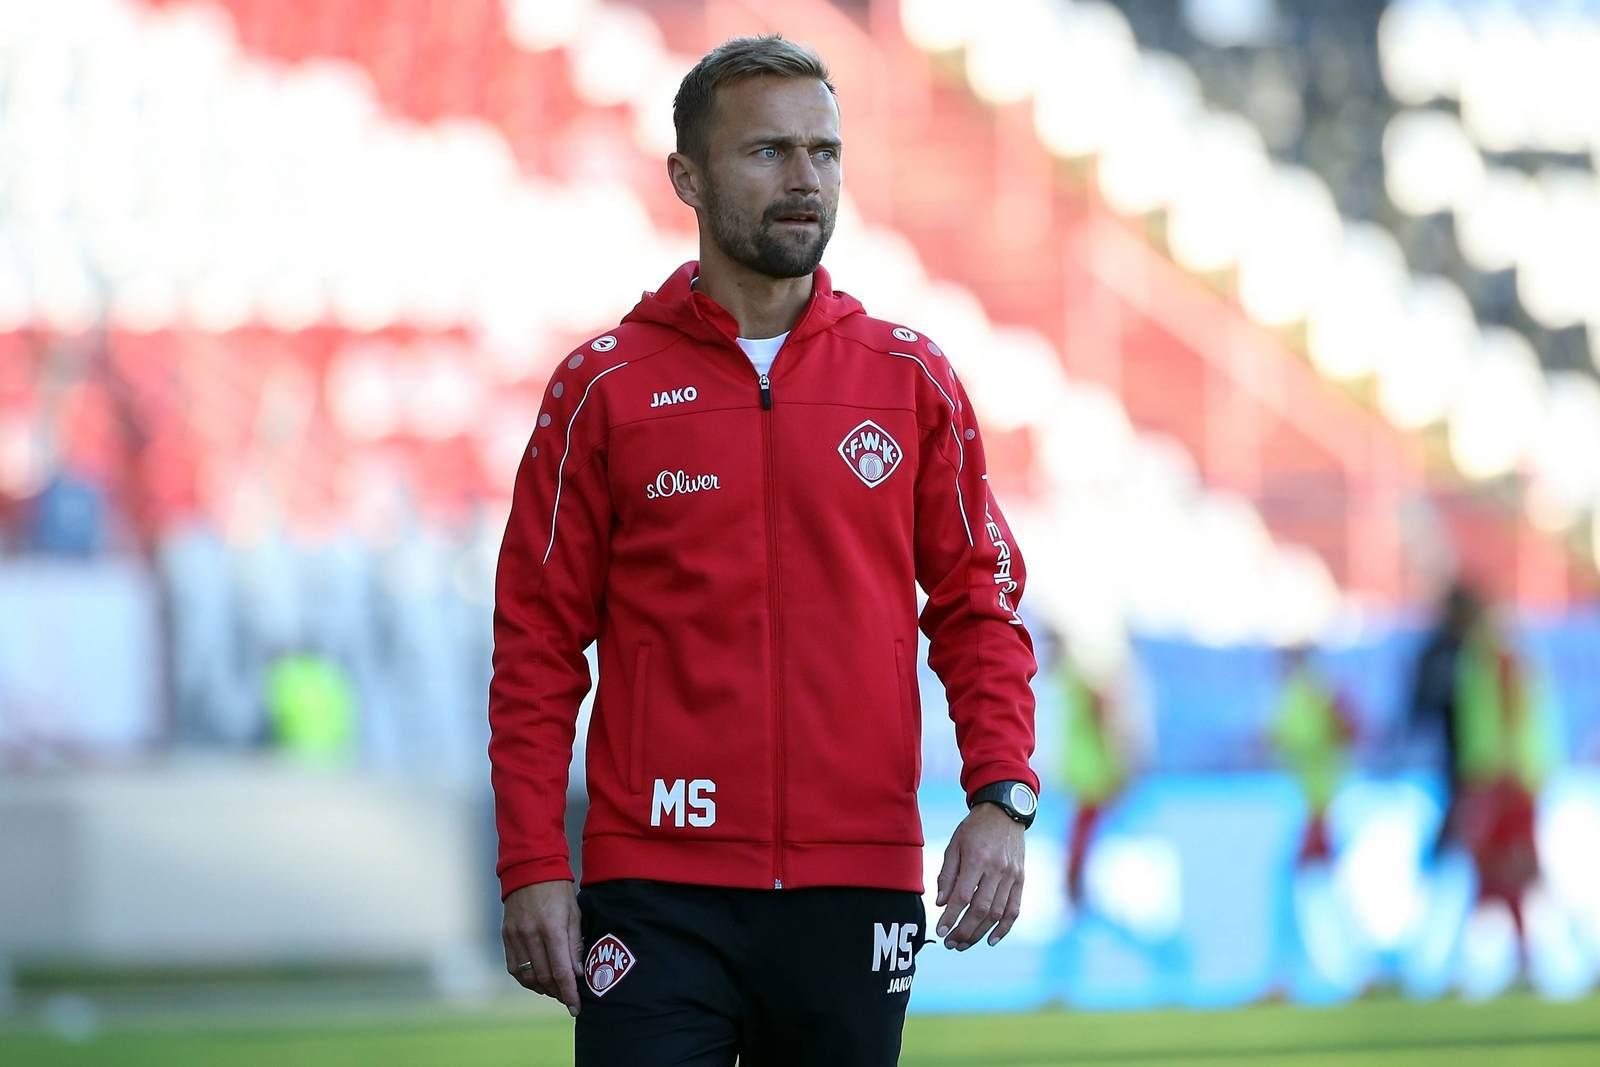 Qual der Wahl: Würzburgs Trainer Michael Schiele